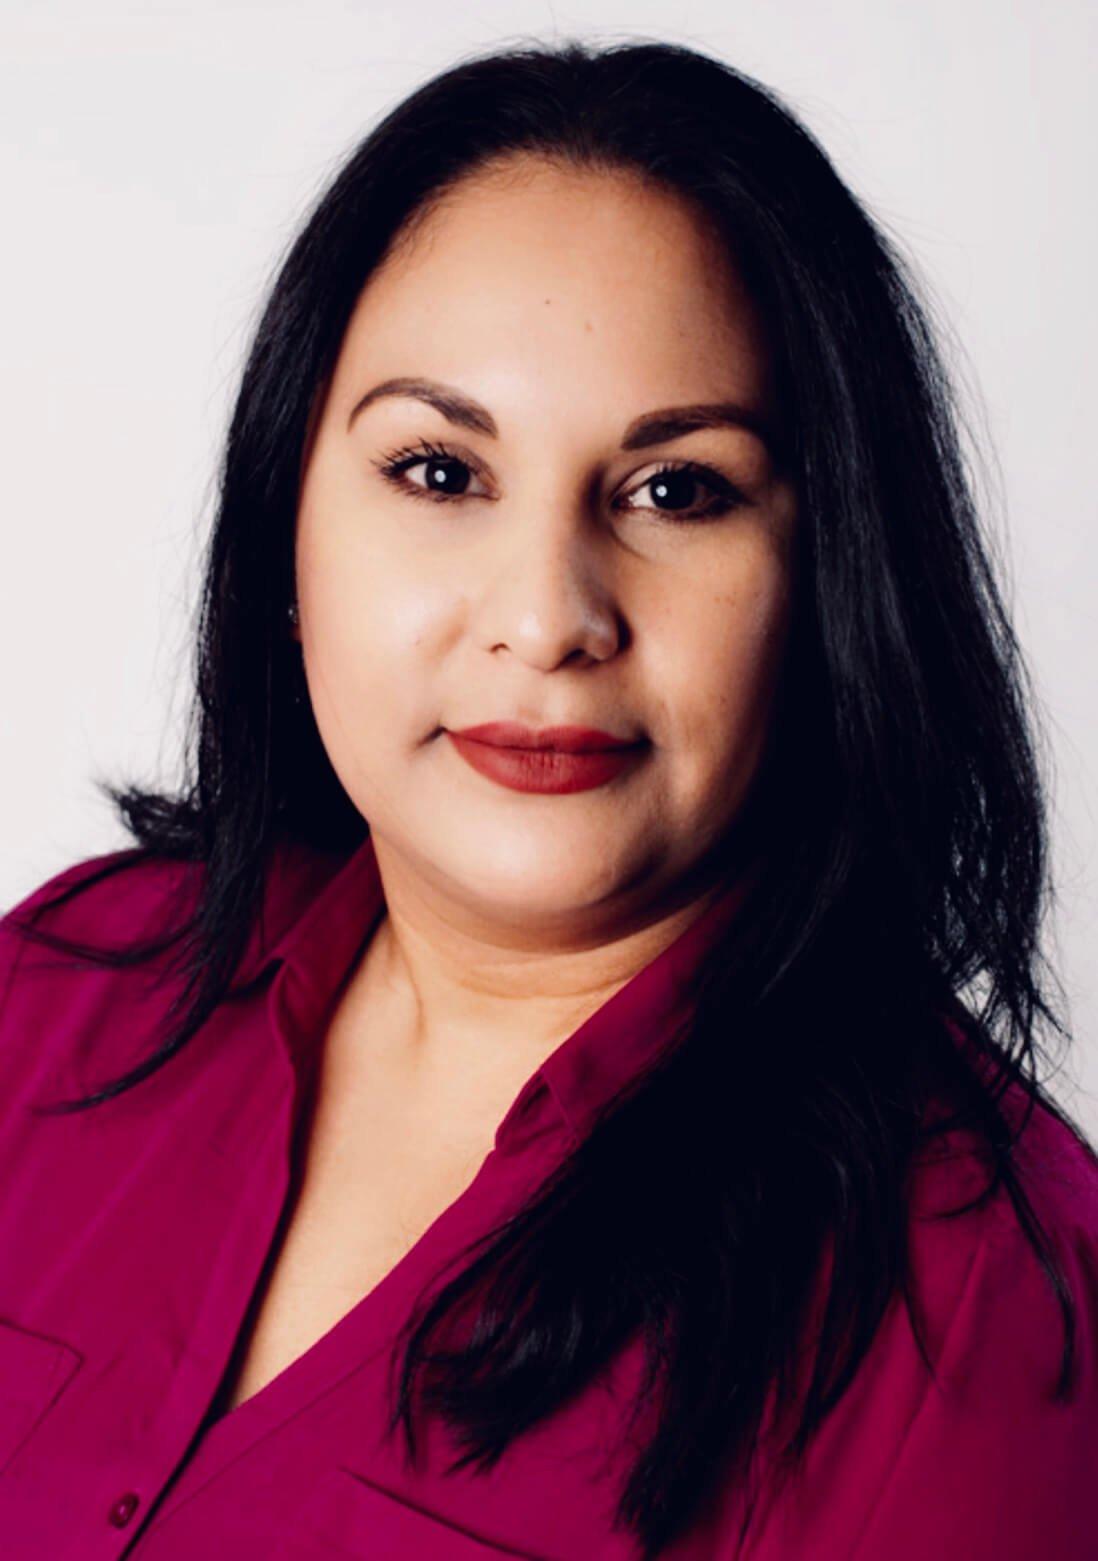 Jeaneth Marenco-Martinez